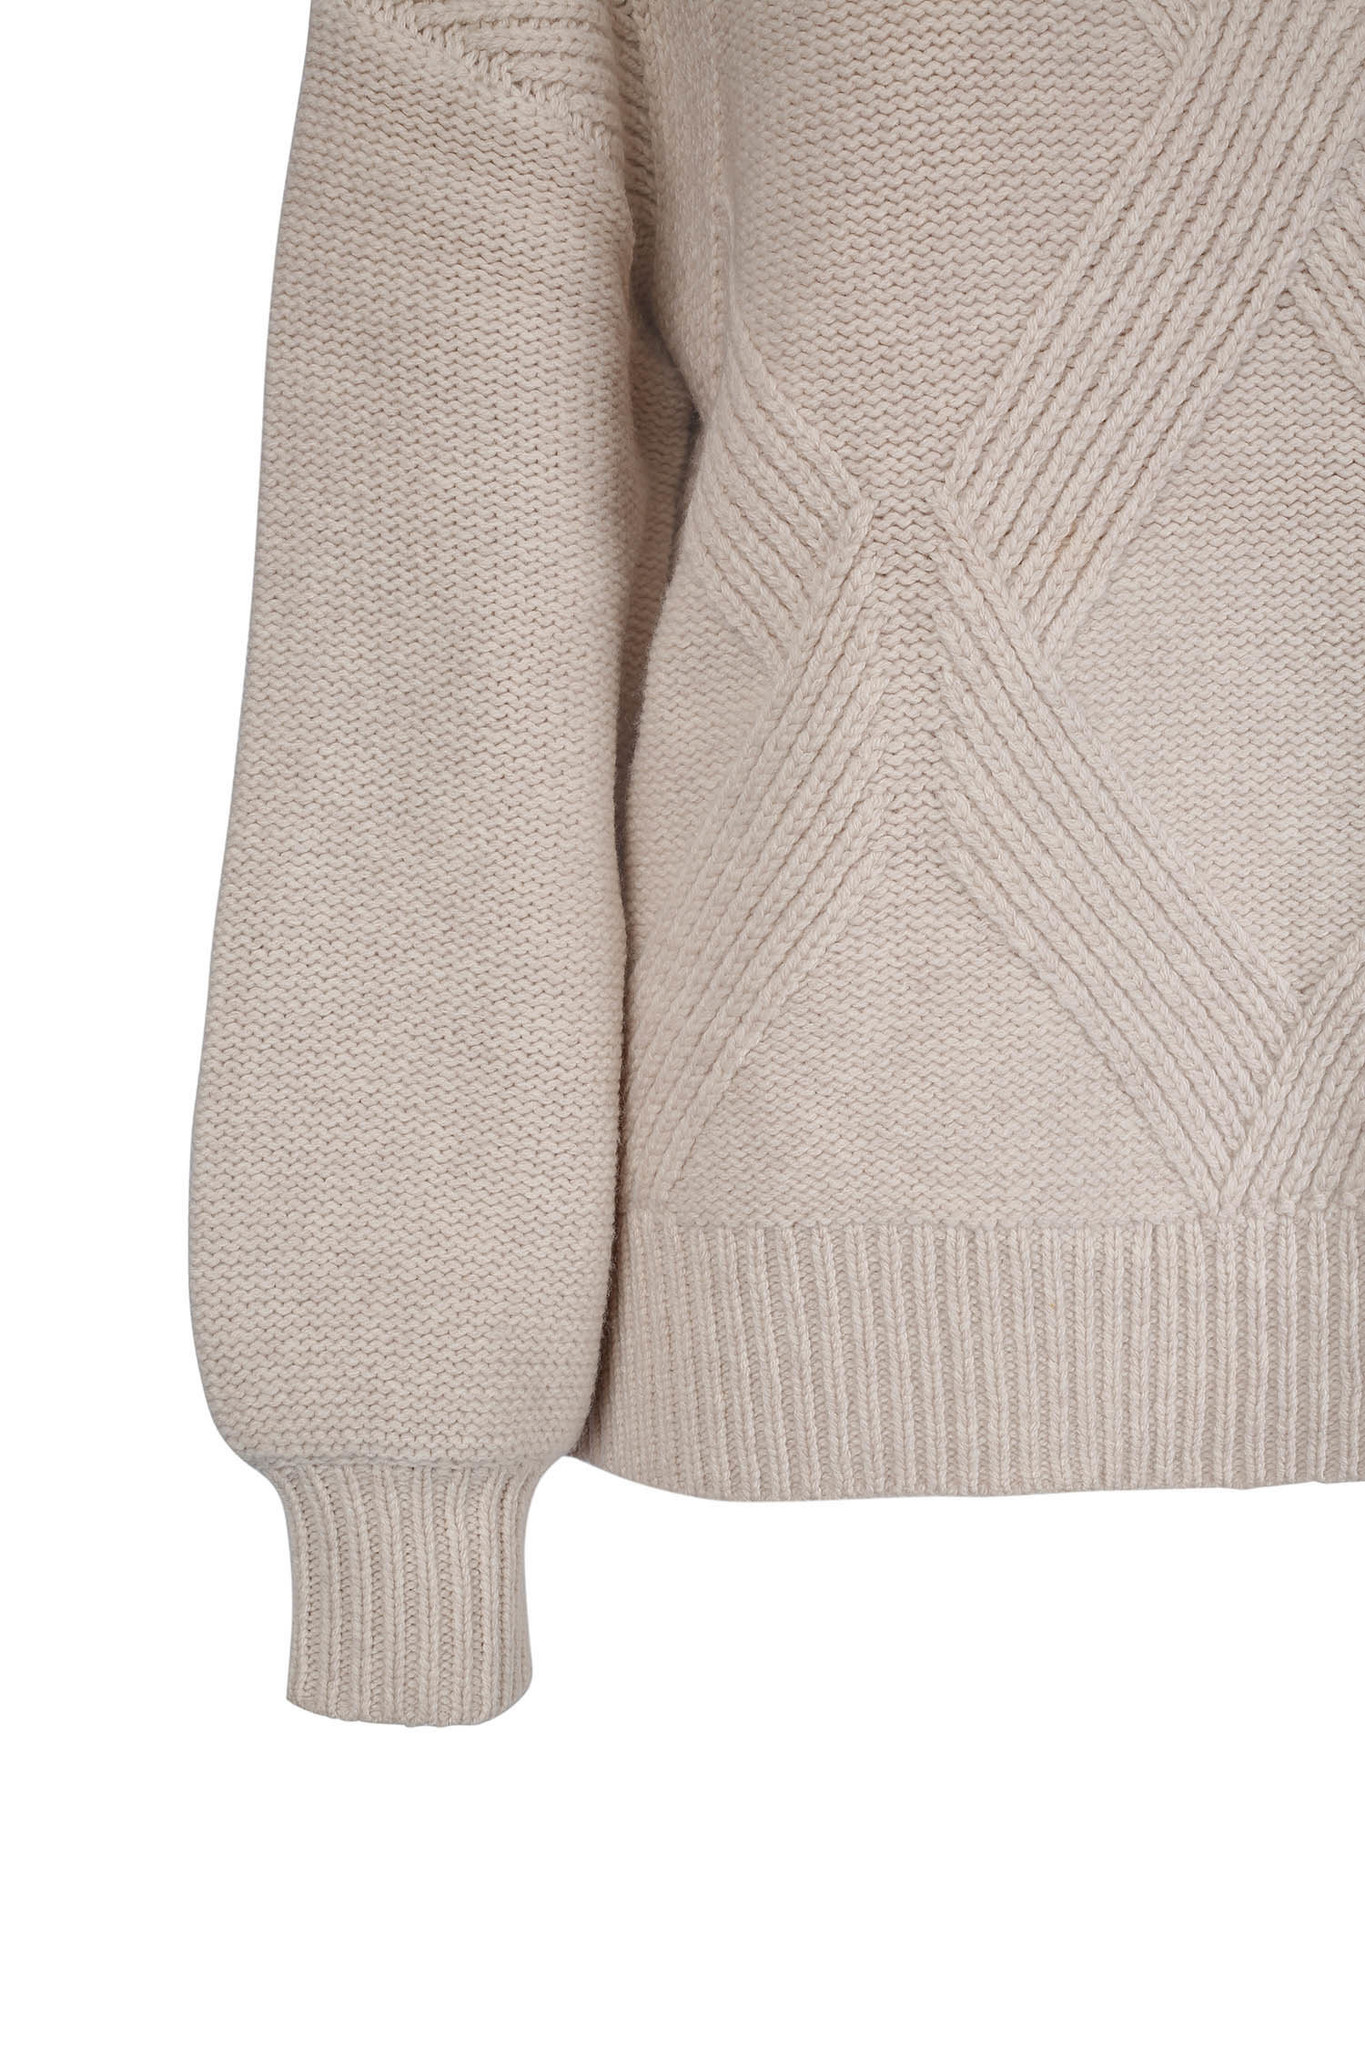 Hermine Sweater - Antique White-3